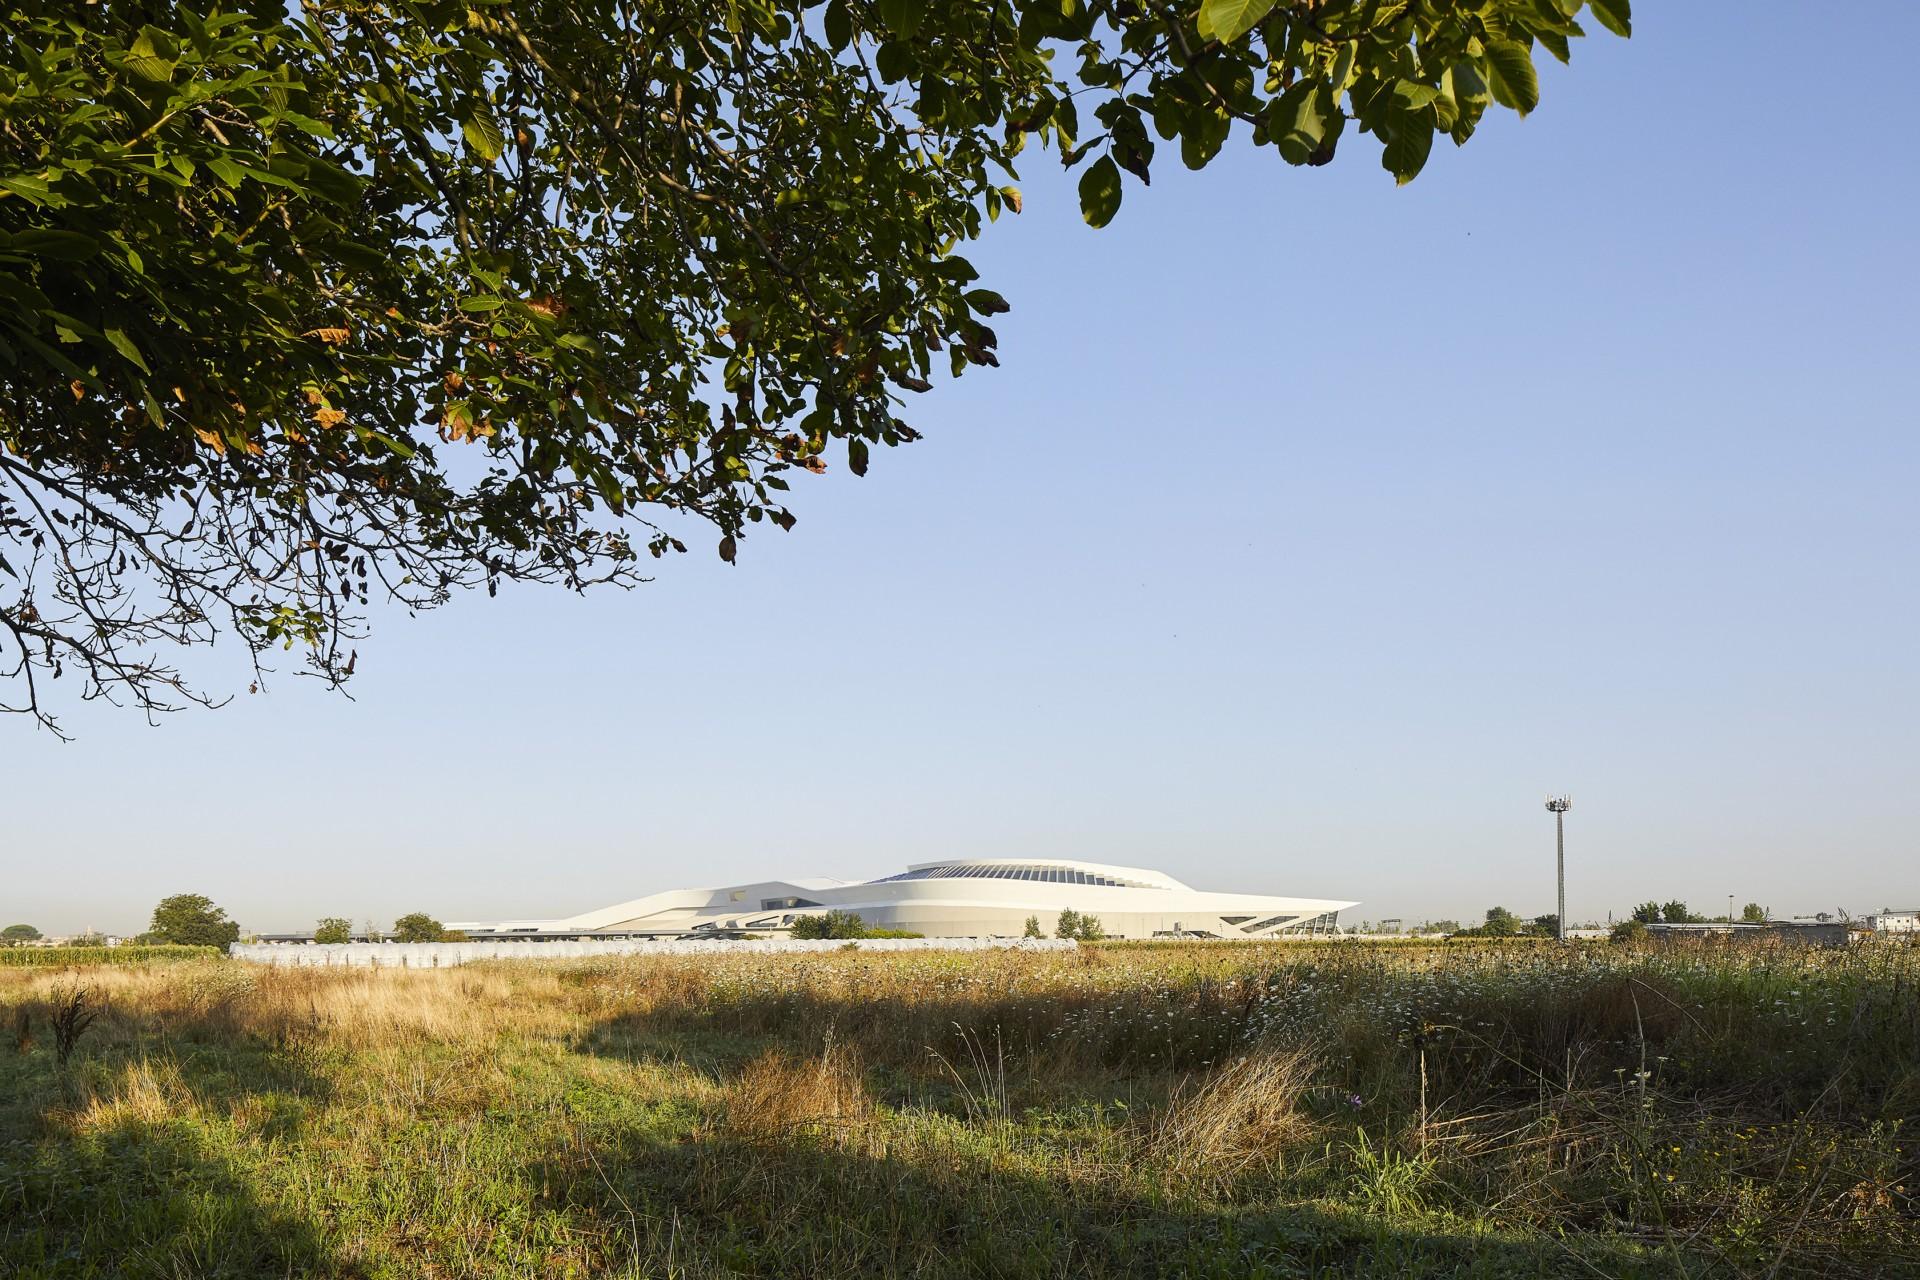 Zaha Hadid Architects High Speed Train Station Napoli-Afragola